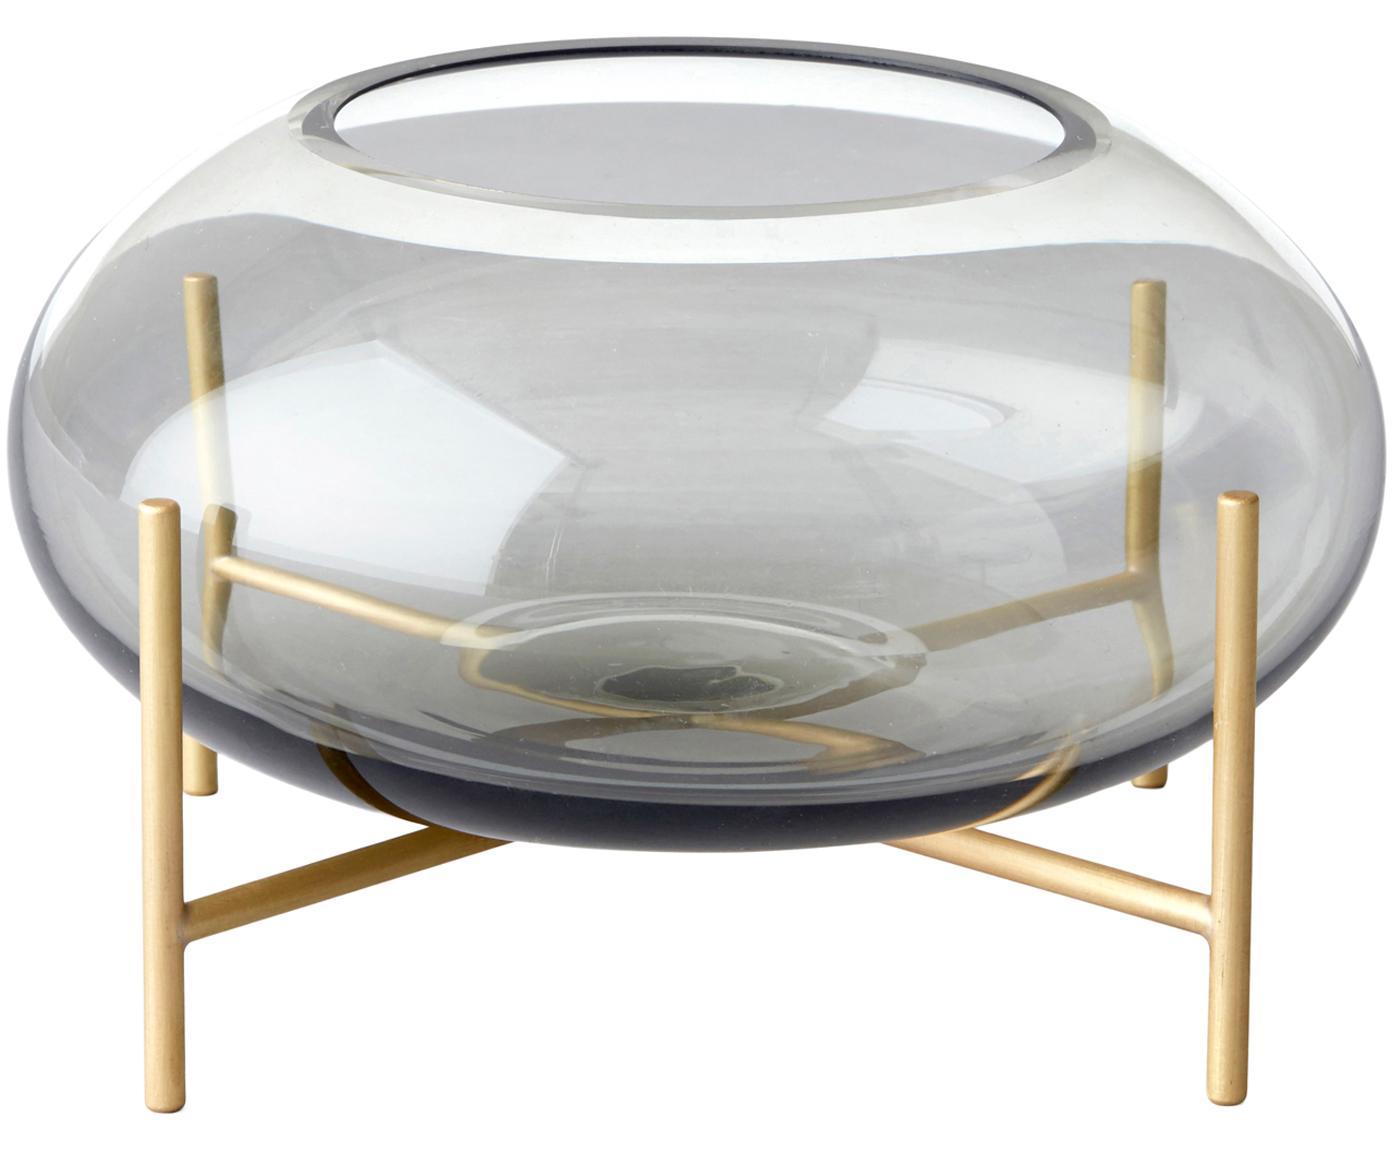 Waxinelichthouder Hurricane, Geborsteld messing Glas, Messingkleurig, grijs, Ø 14 x H 9 cm